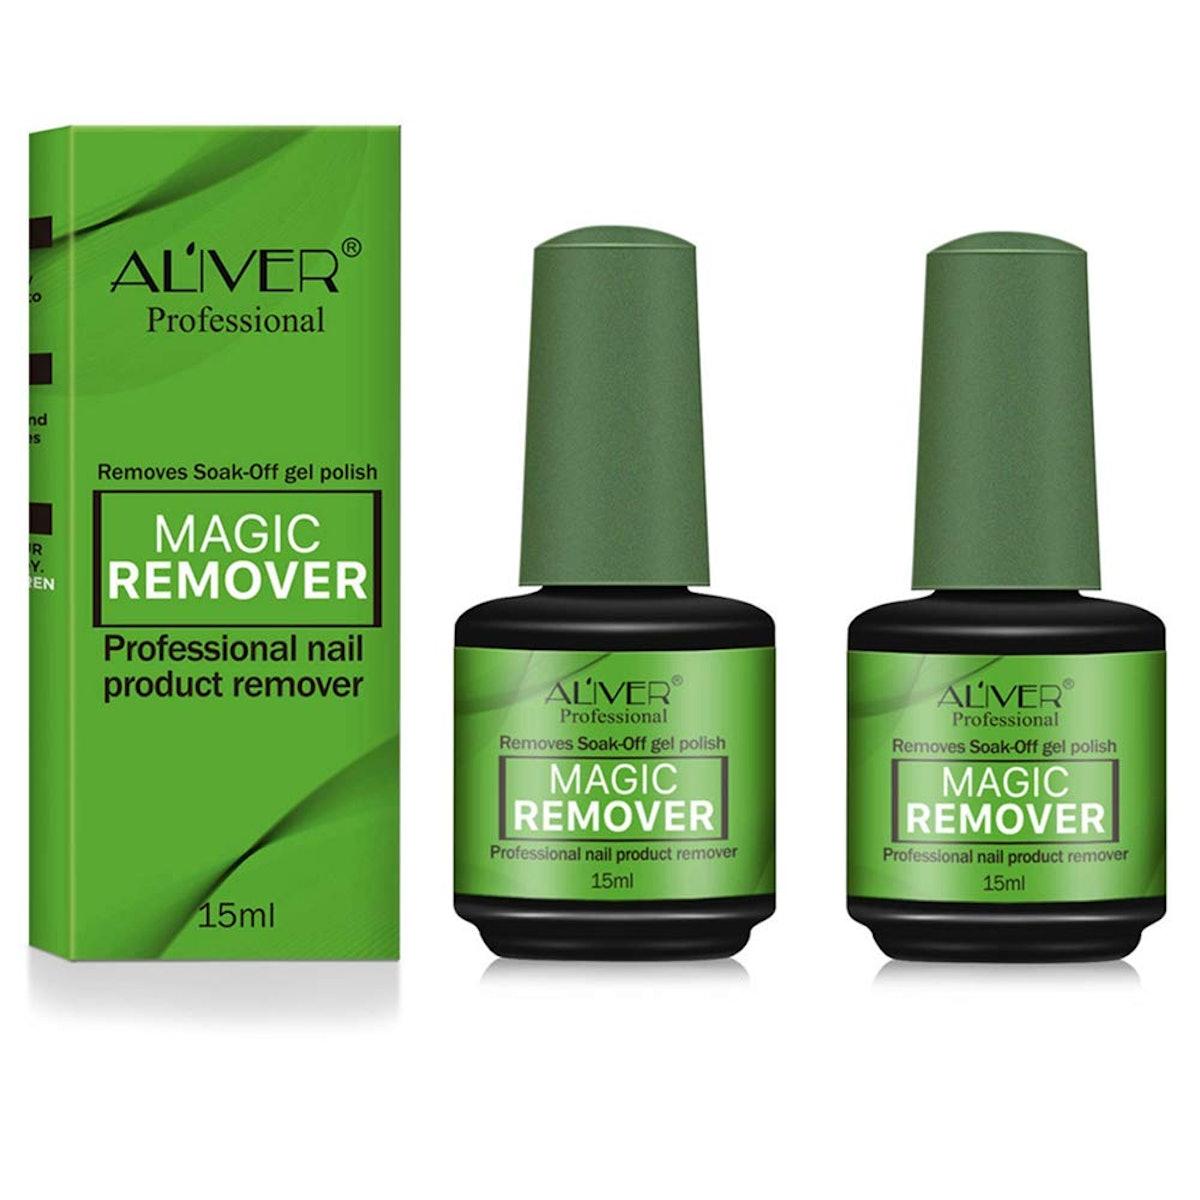 ALIVER Magic Nail Polish Remover (2-Pack)